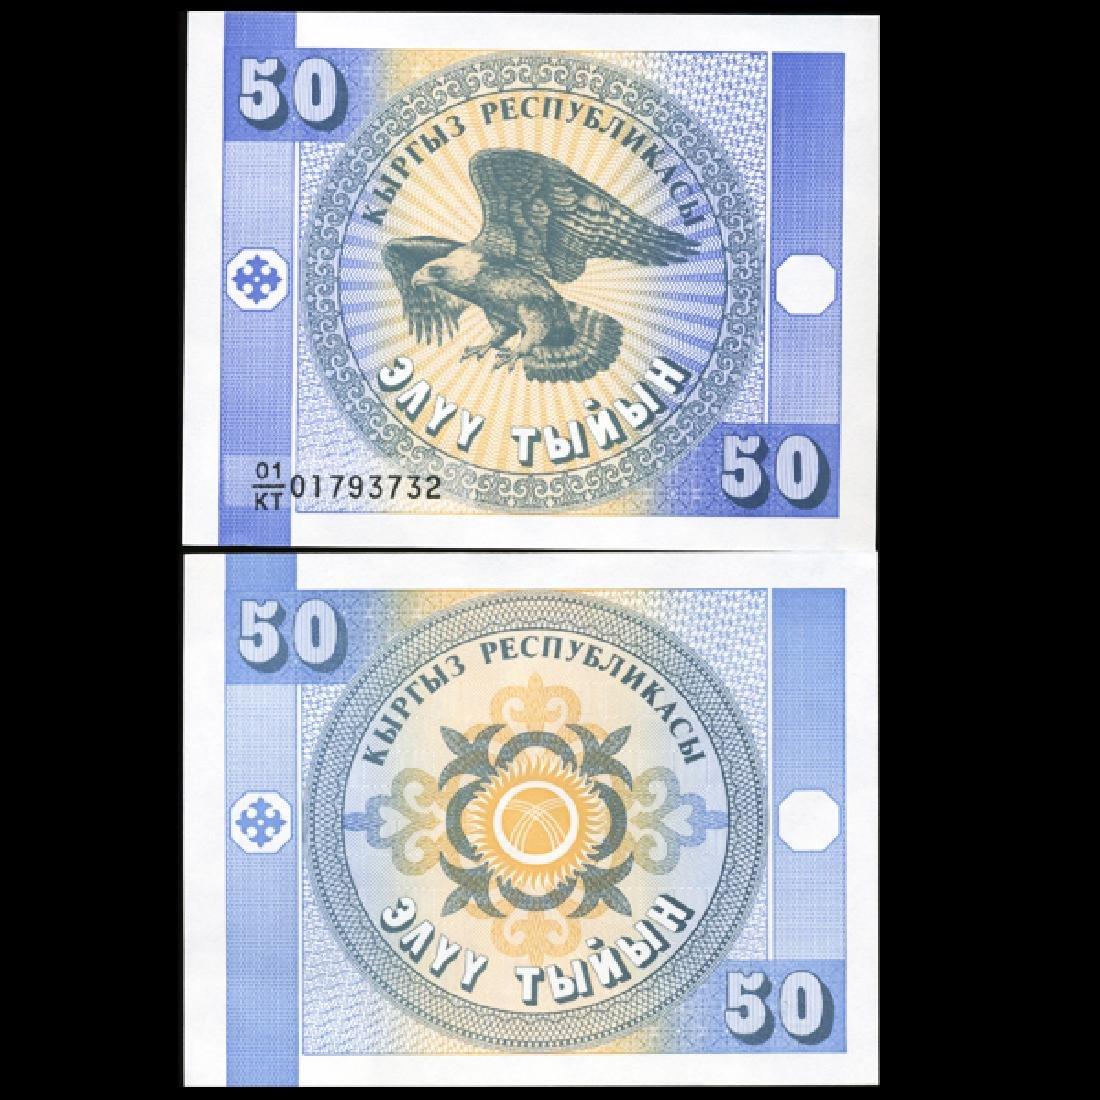 1993 Kyrgyzstan 50 Tyiyn Note GEM Crisp Unc